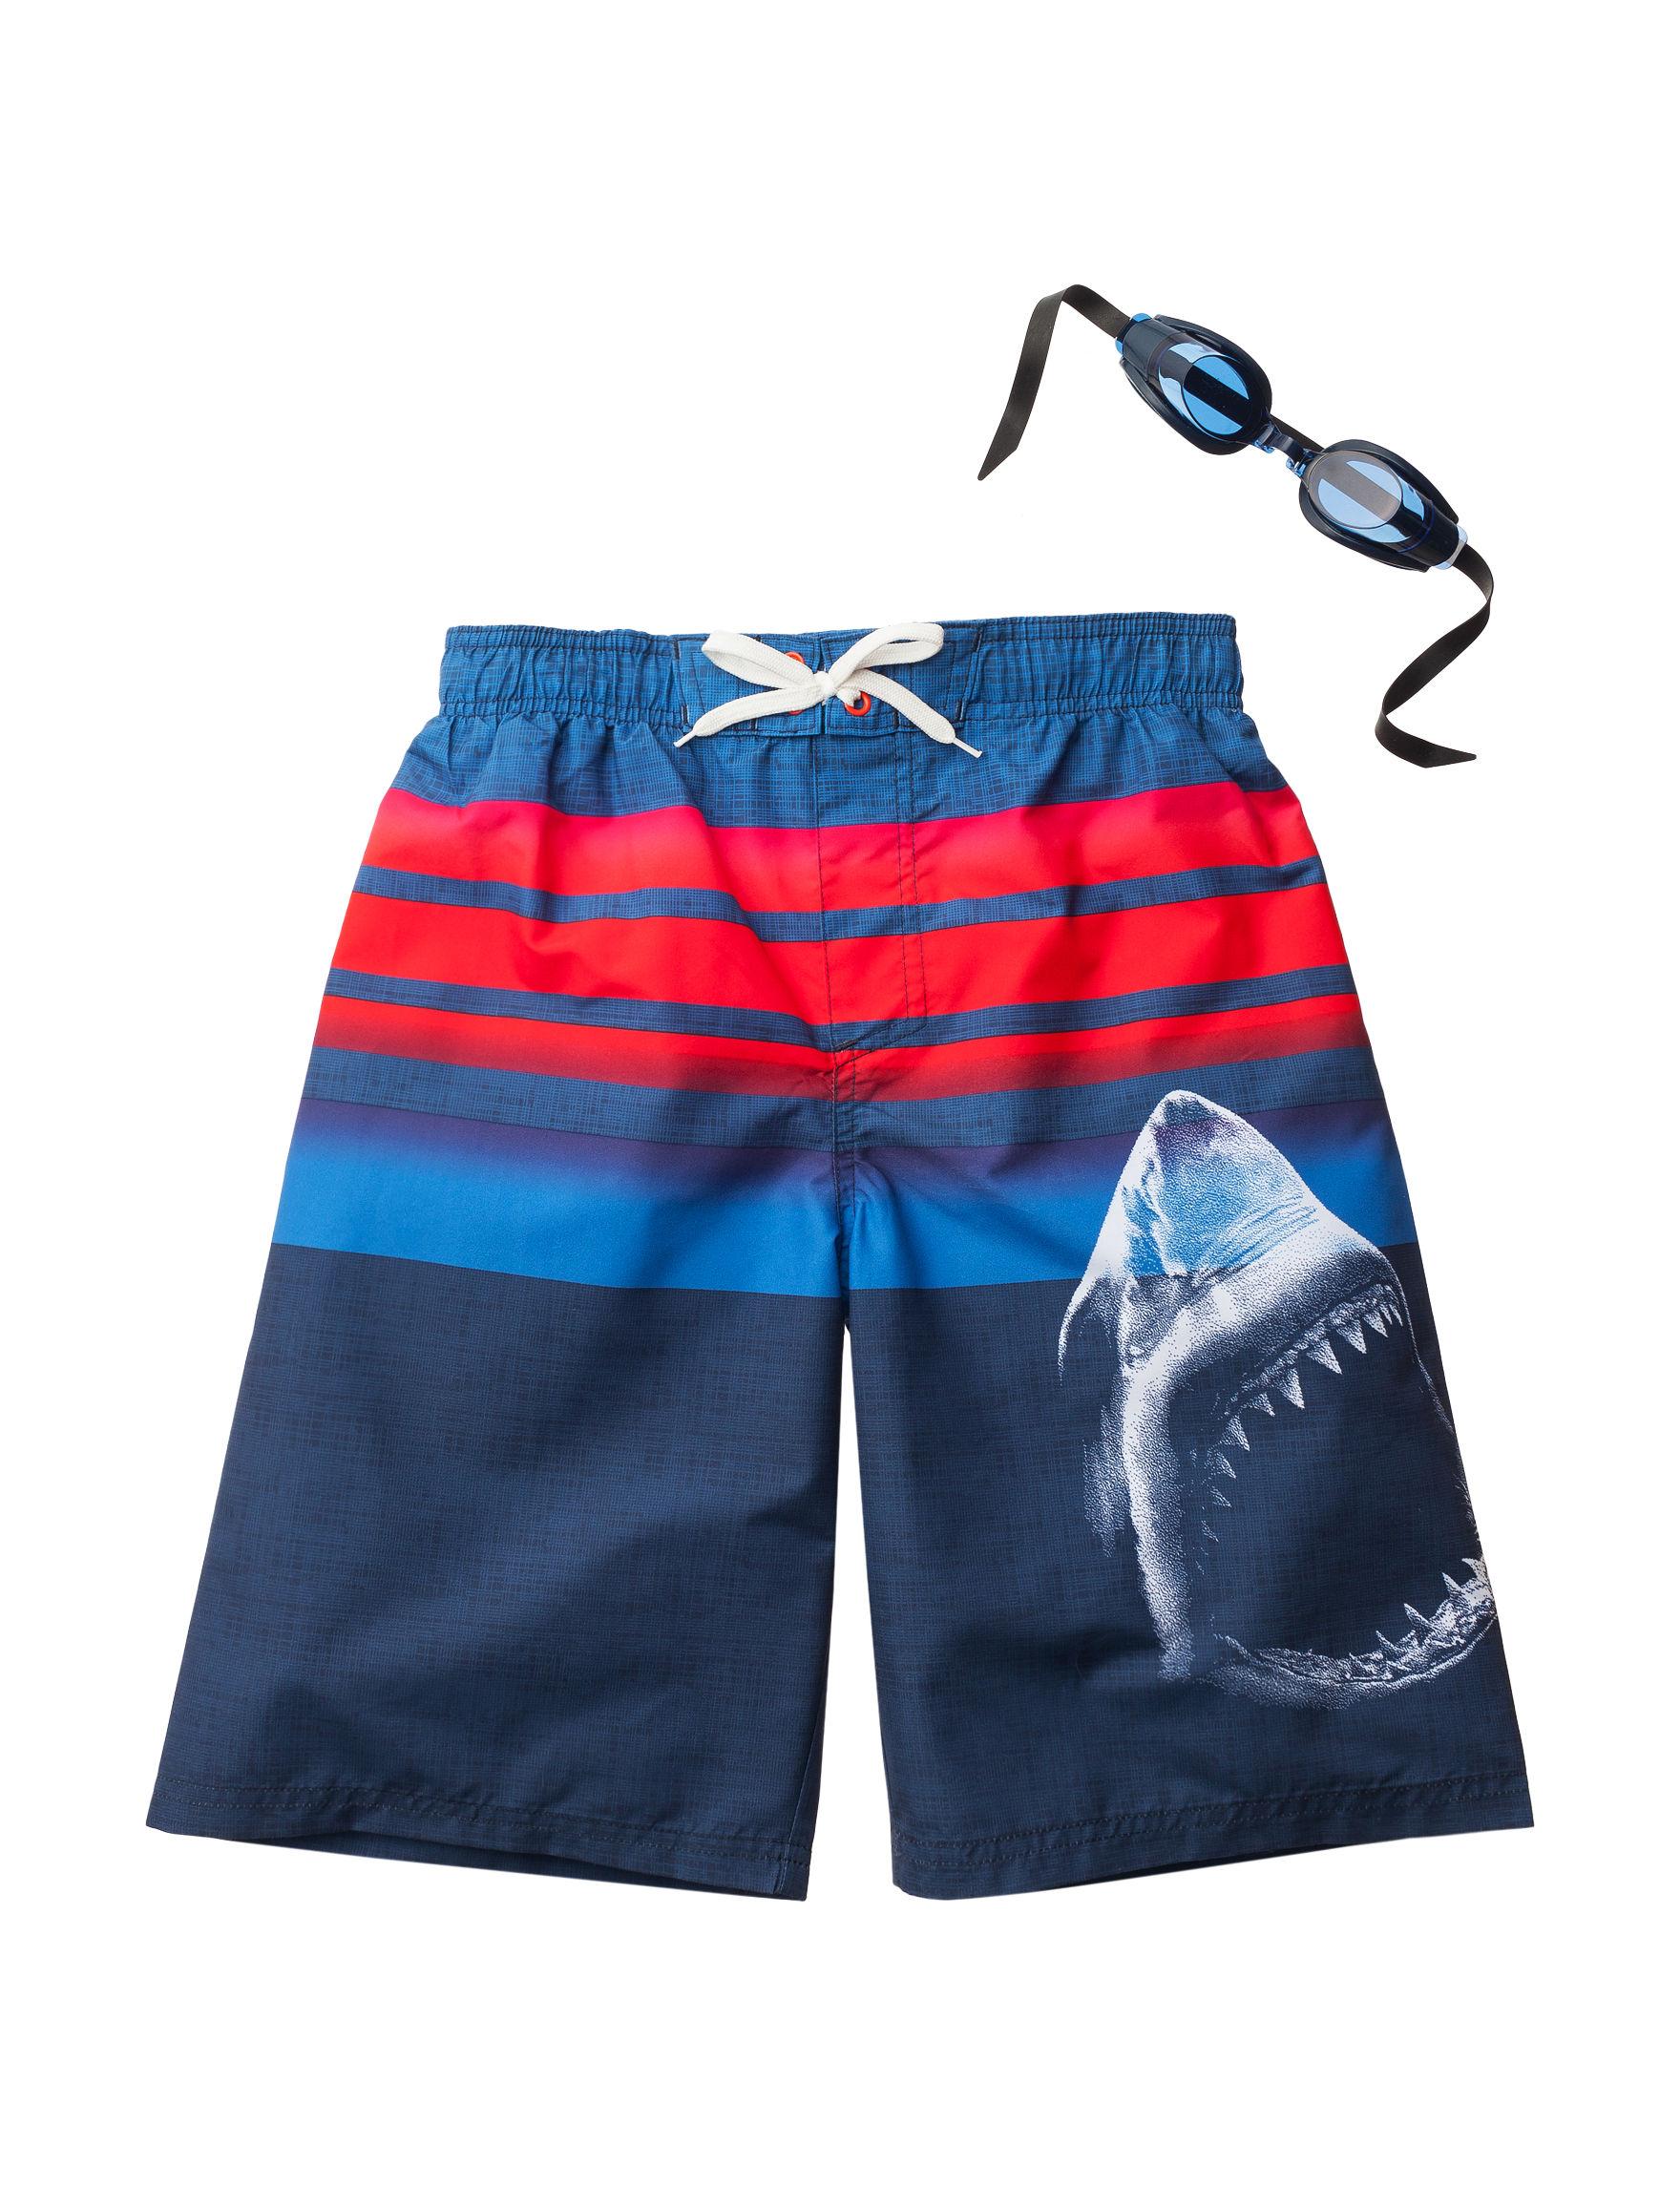 I Apparel Navy Swimsuit Bottoms